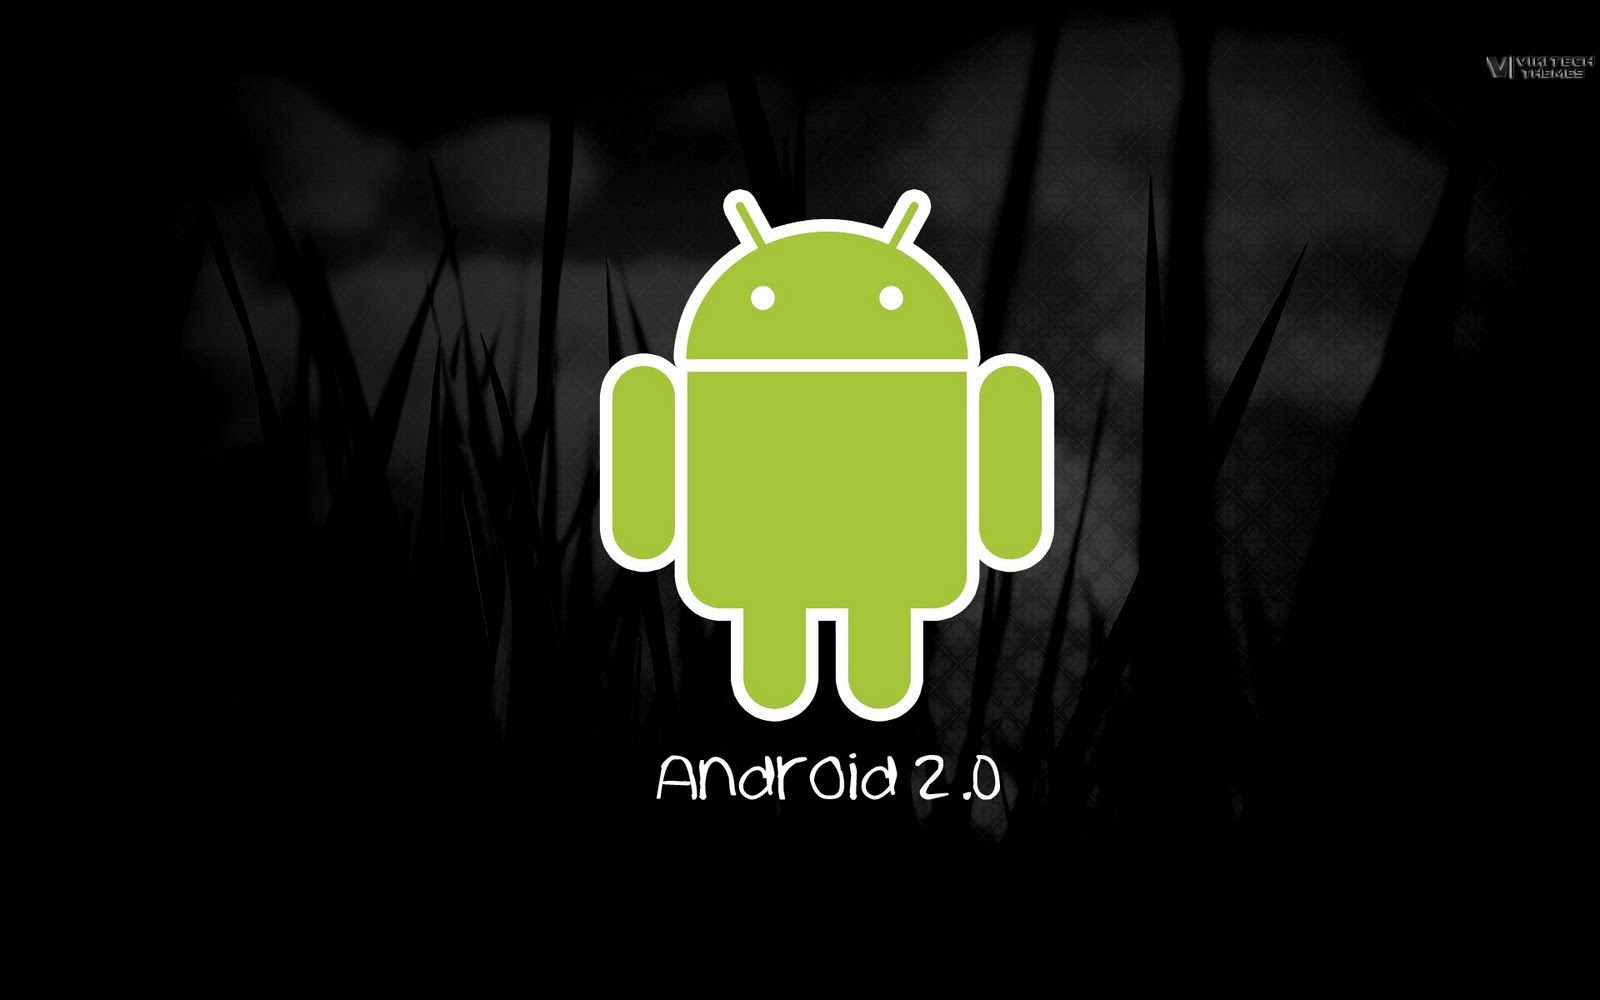 http://2.bp.blogspot.com/_E26Ndy_oKVc/TPlqONmgcnI/AAAAAAAAAxw/JKHoWFANByo/s1600/Wallpaper+Android+%252817%2529.jpg